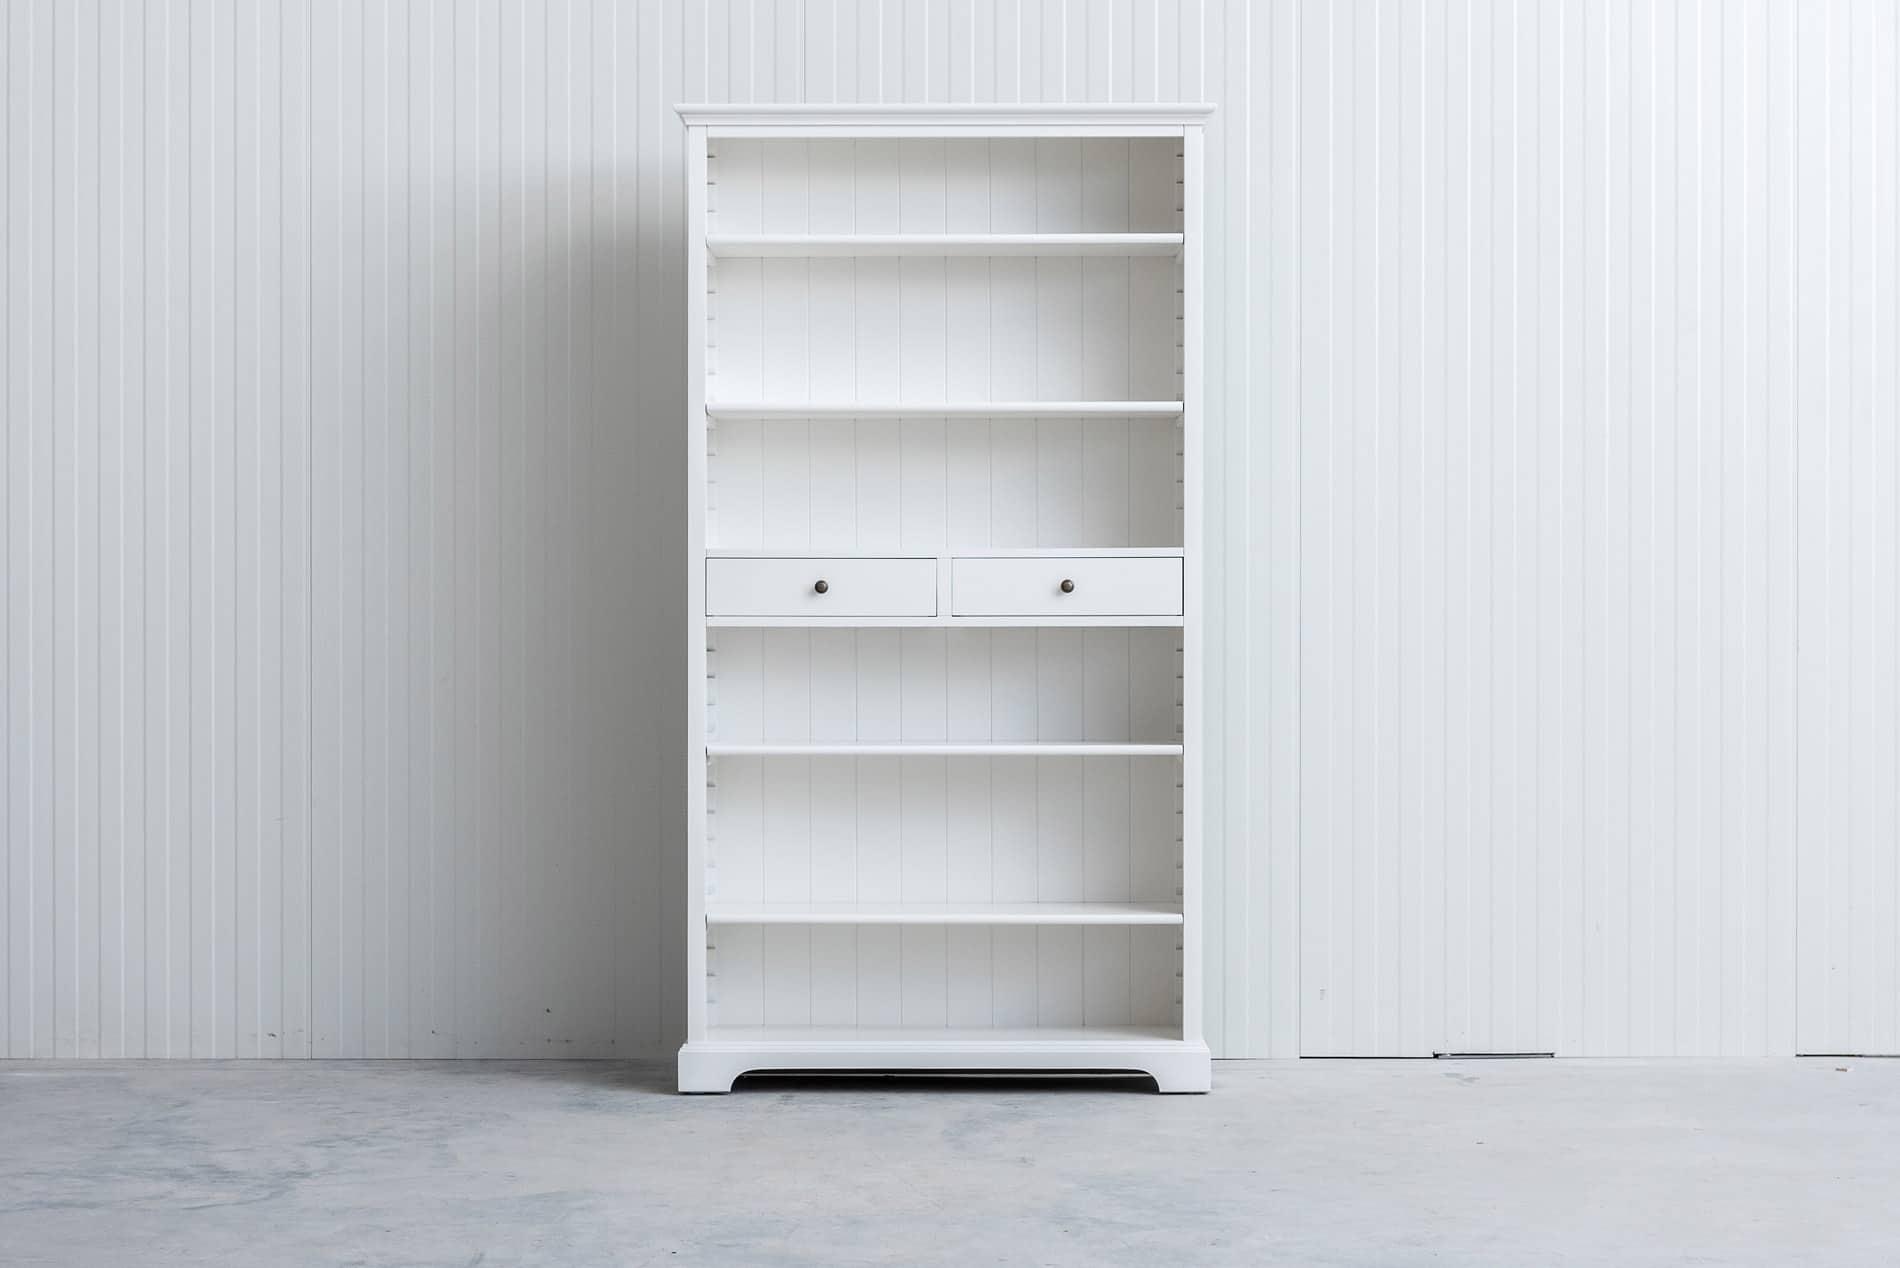 Landelijke boekenkast 1m – Wit